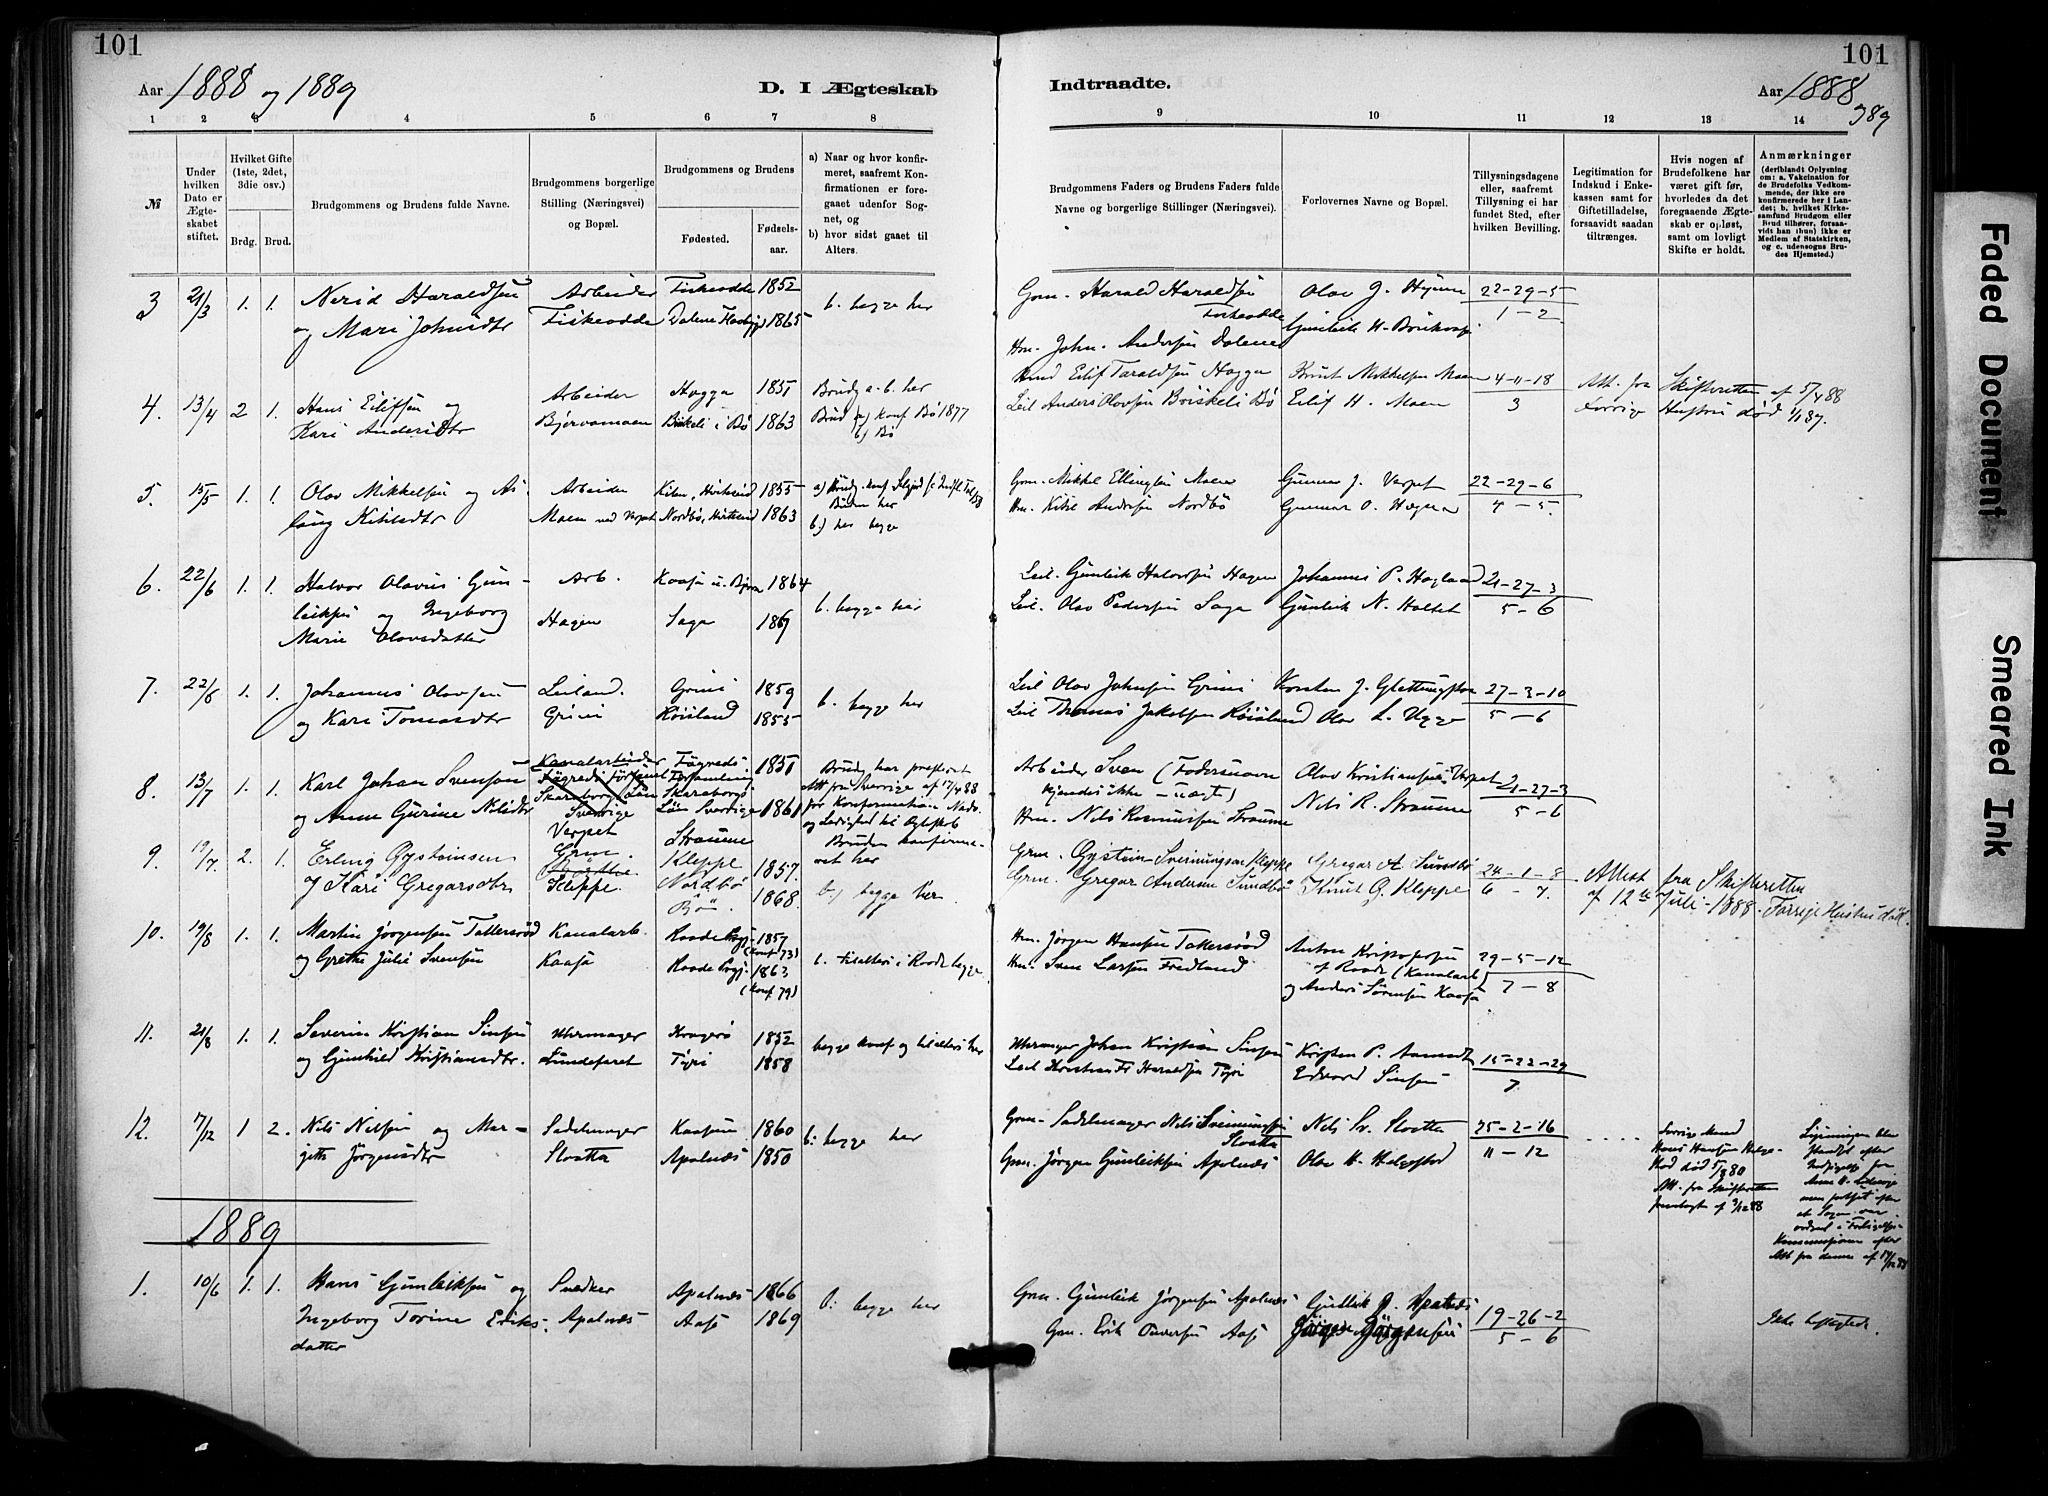 SAKO, Lunde kirkebøker, F/Fa/L0002: Ministerialbok nr. I 2, 1884-1892, s. 101